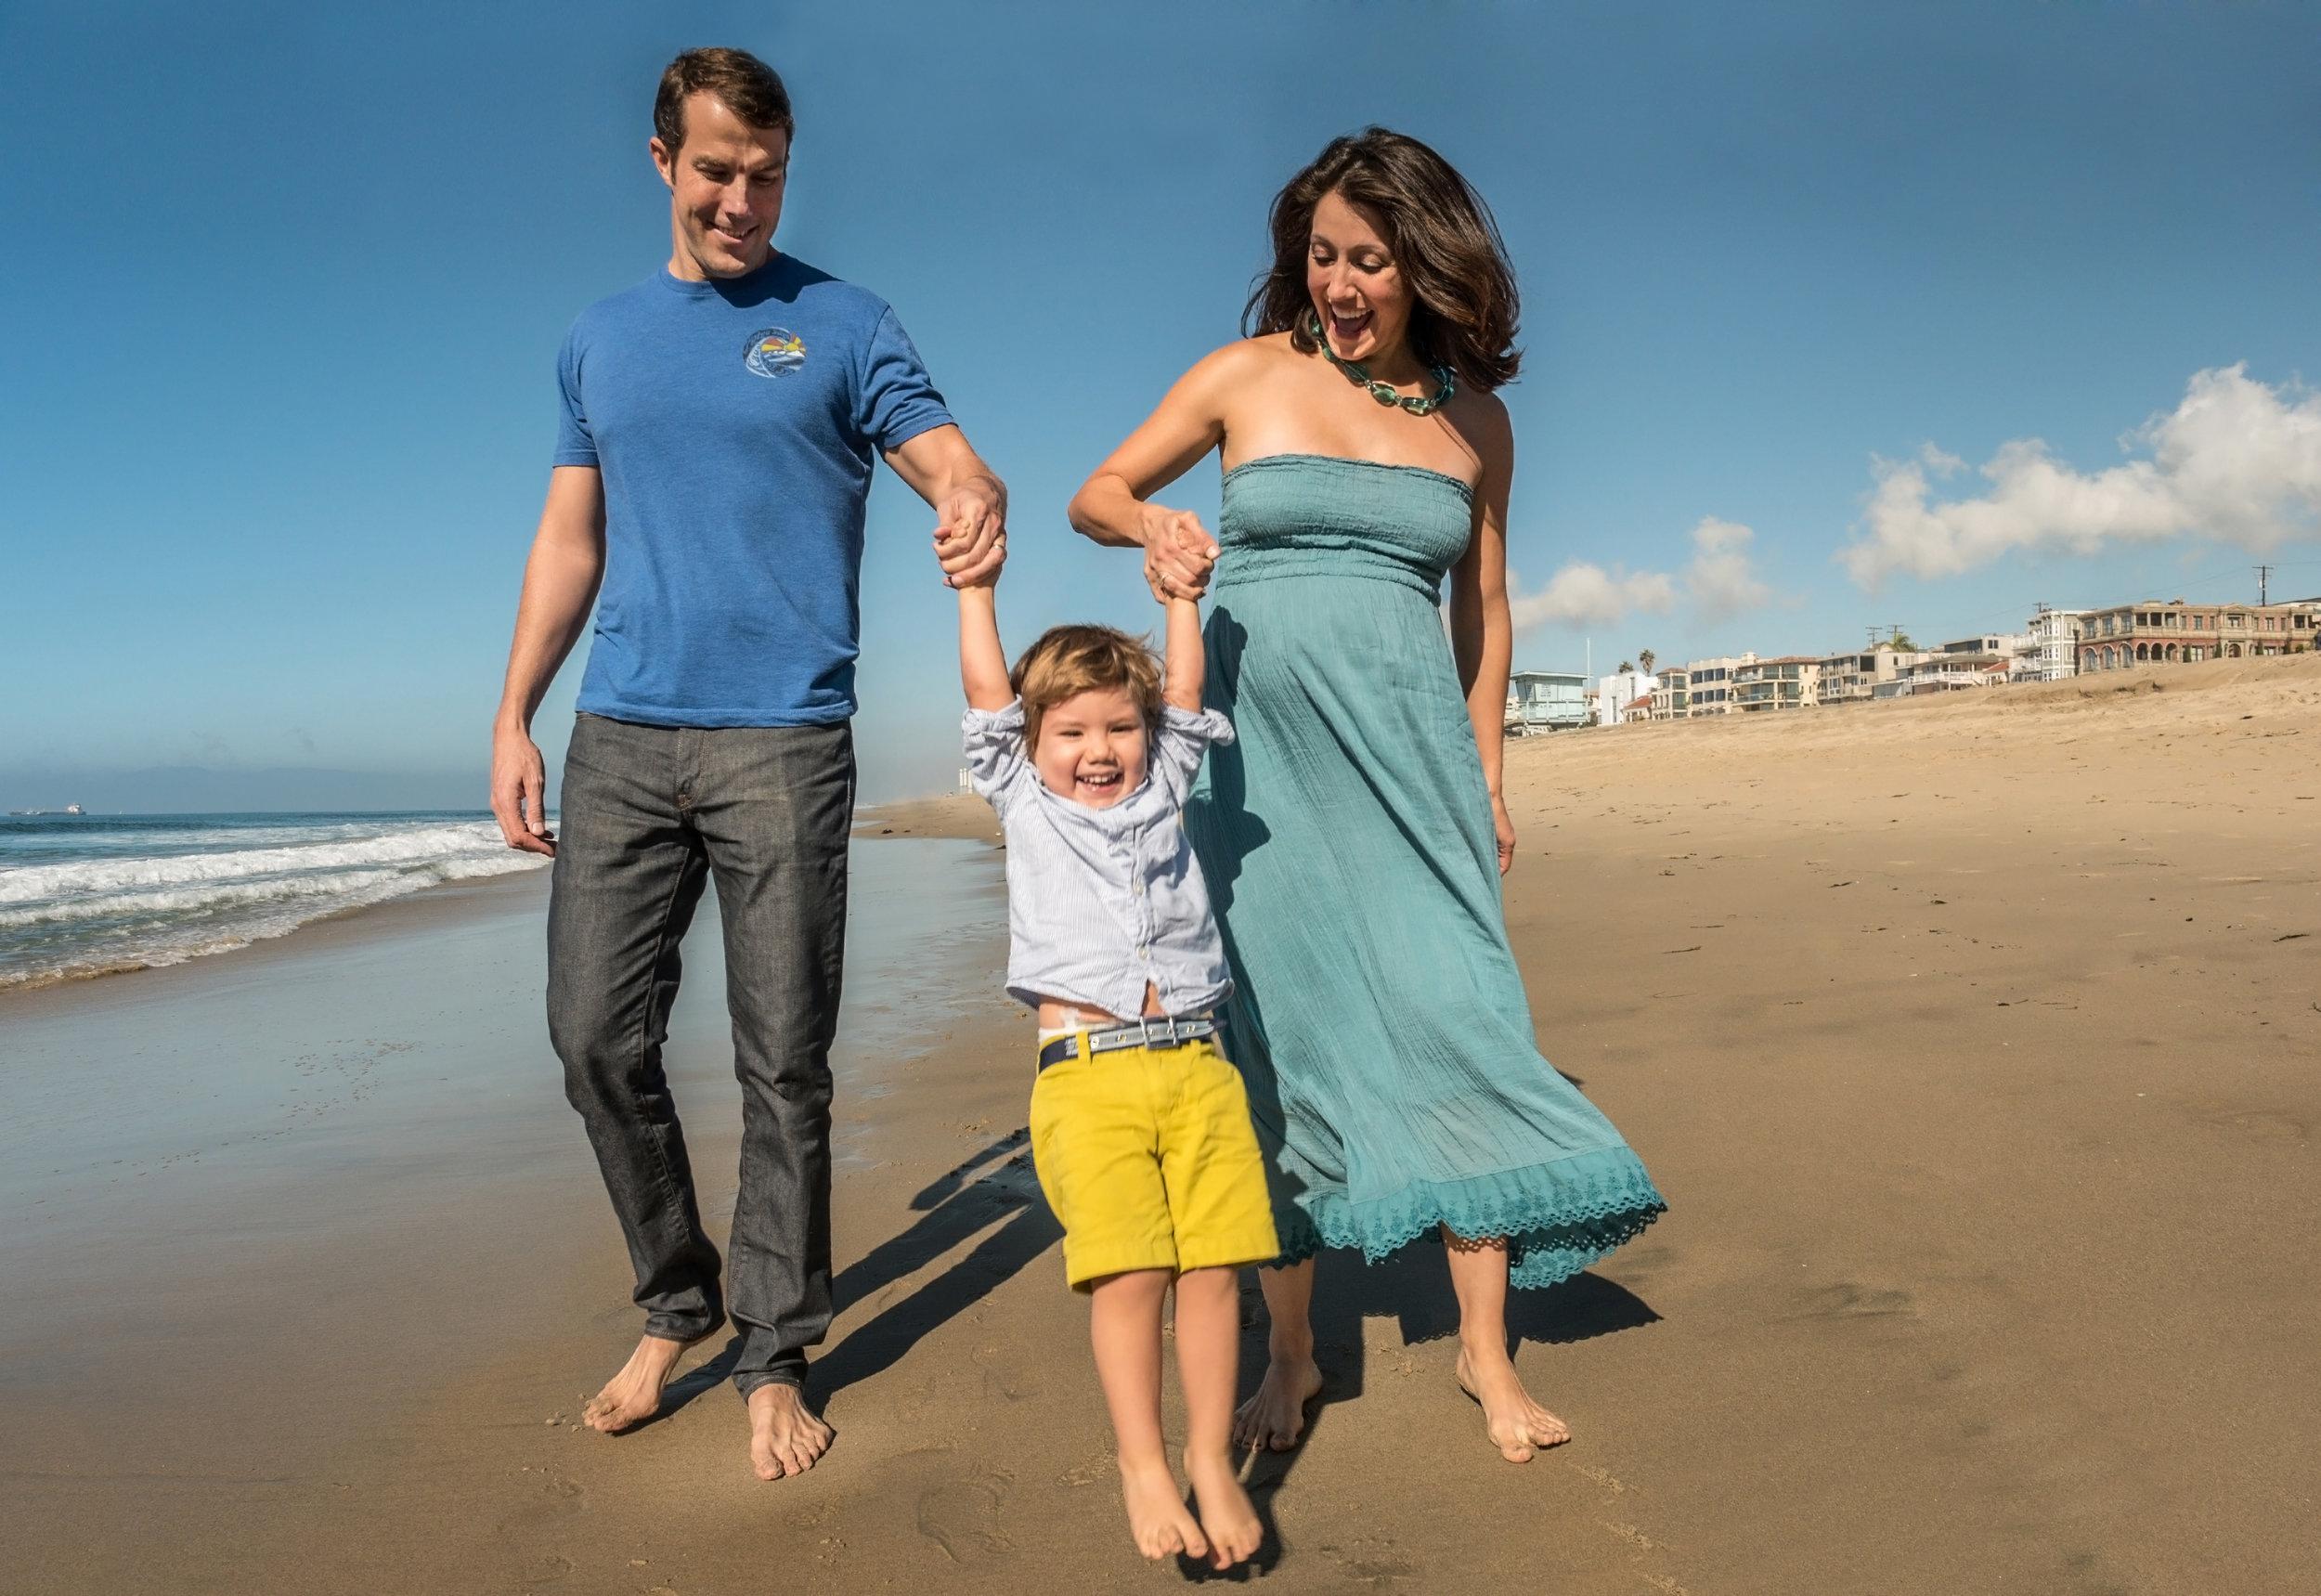 Family of three having fun at the beach